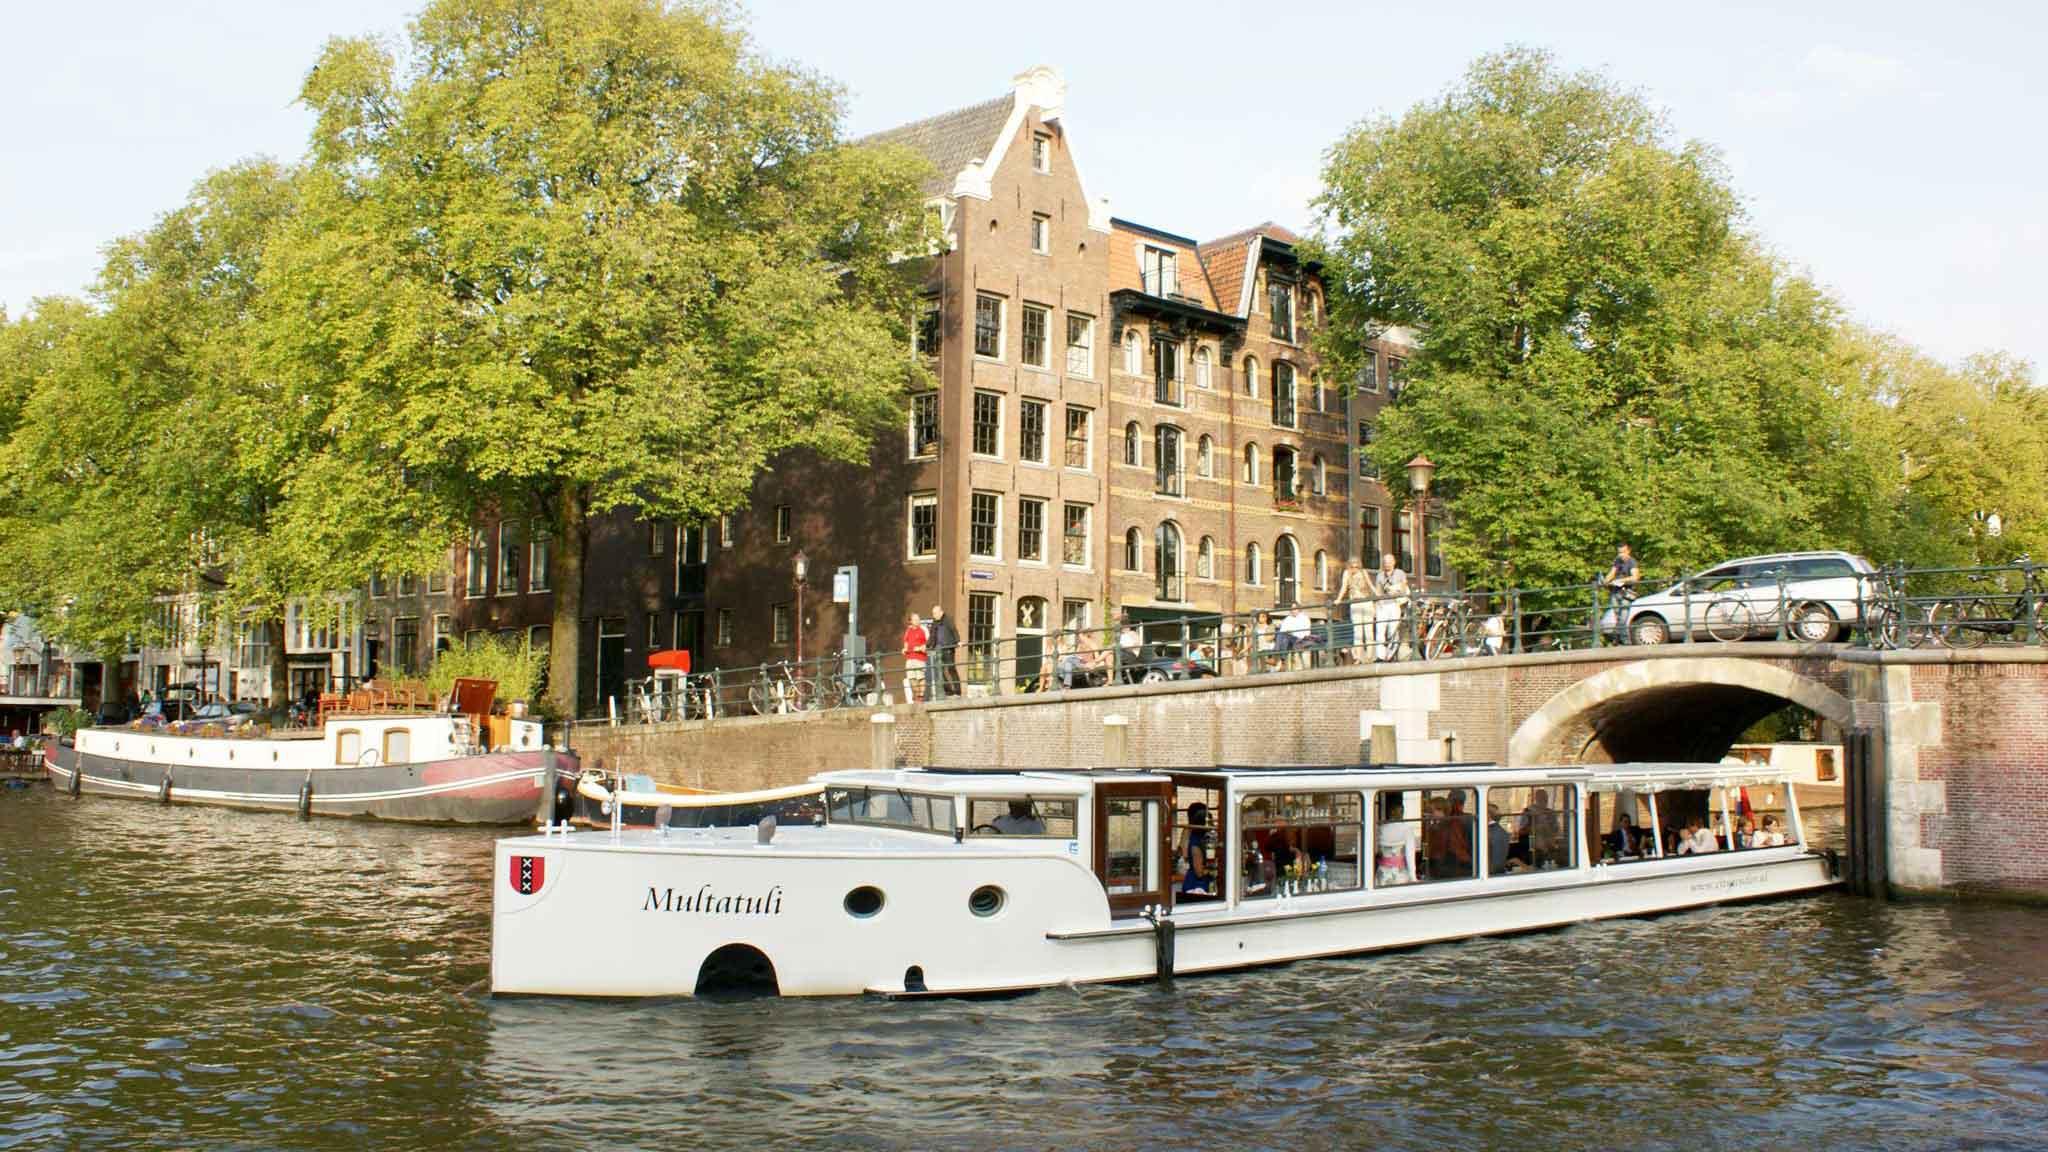 Overdekte boot huren Amsterdam - Multatuli op de gracht